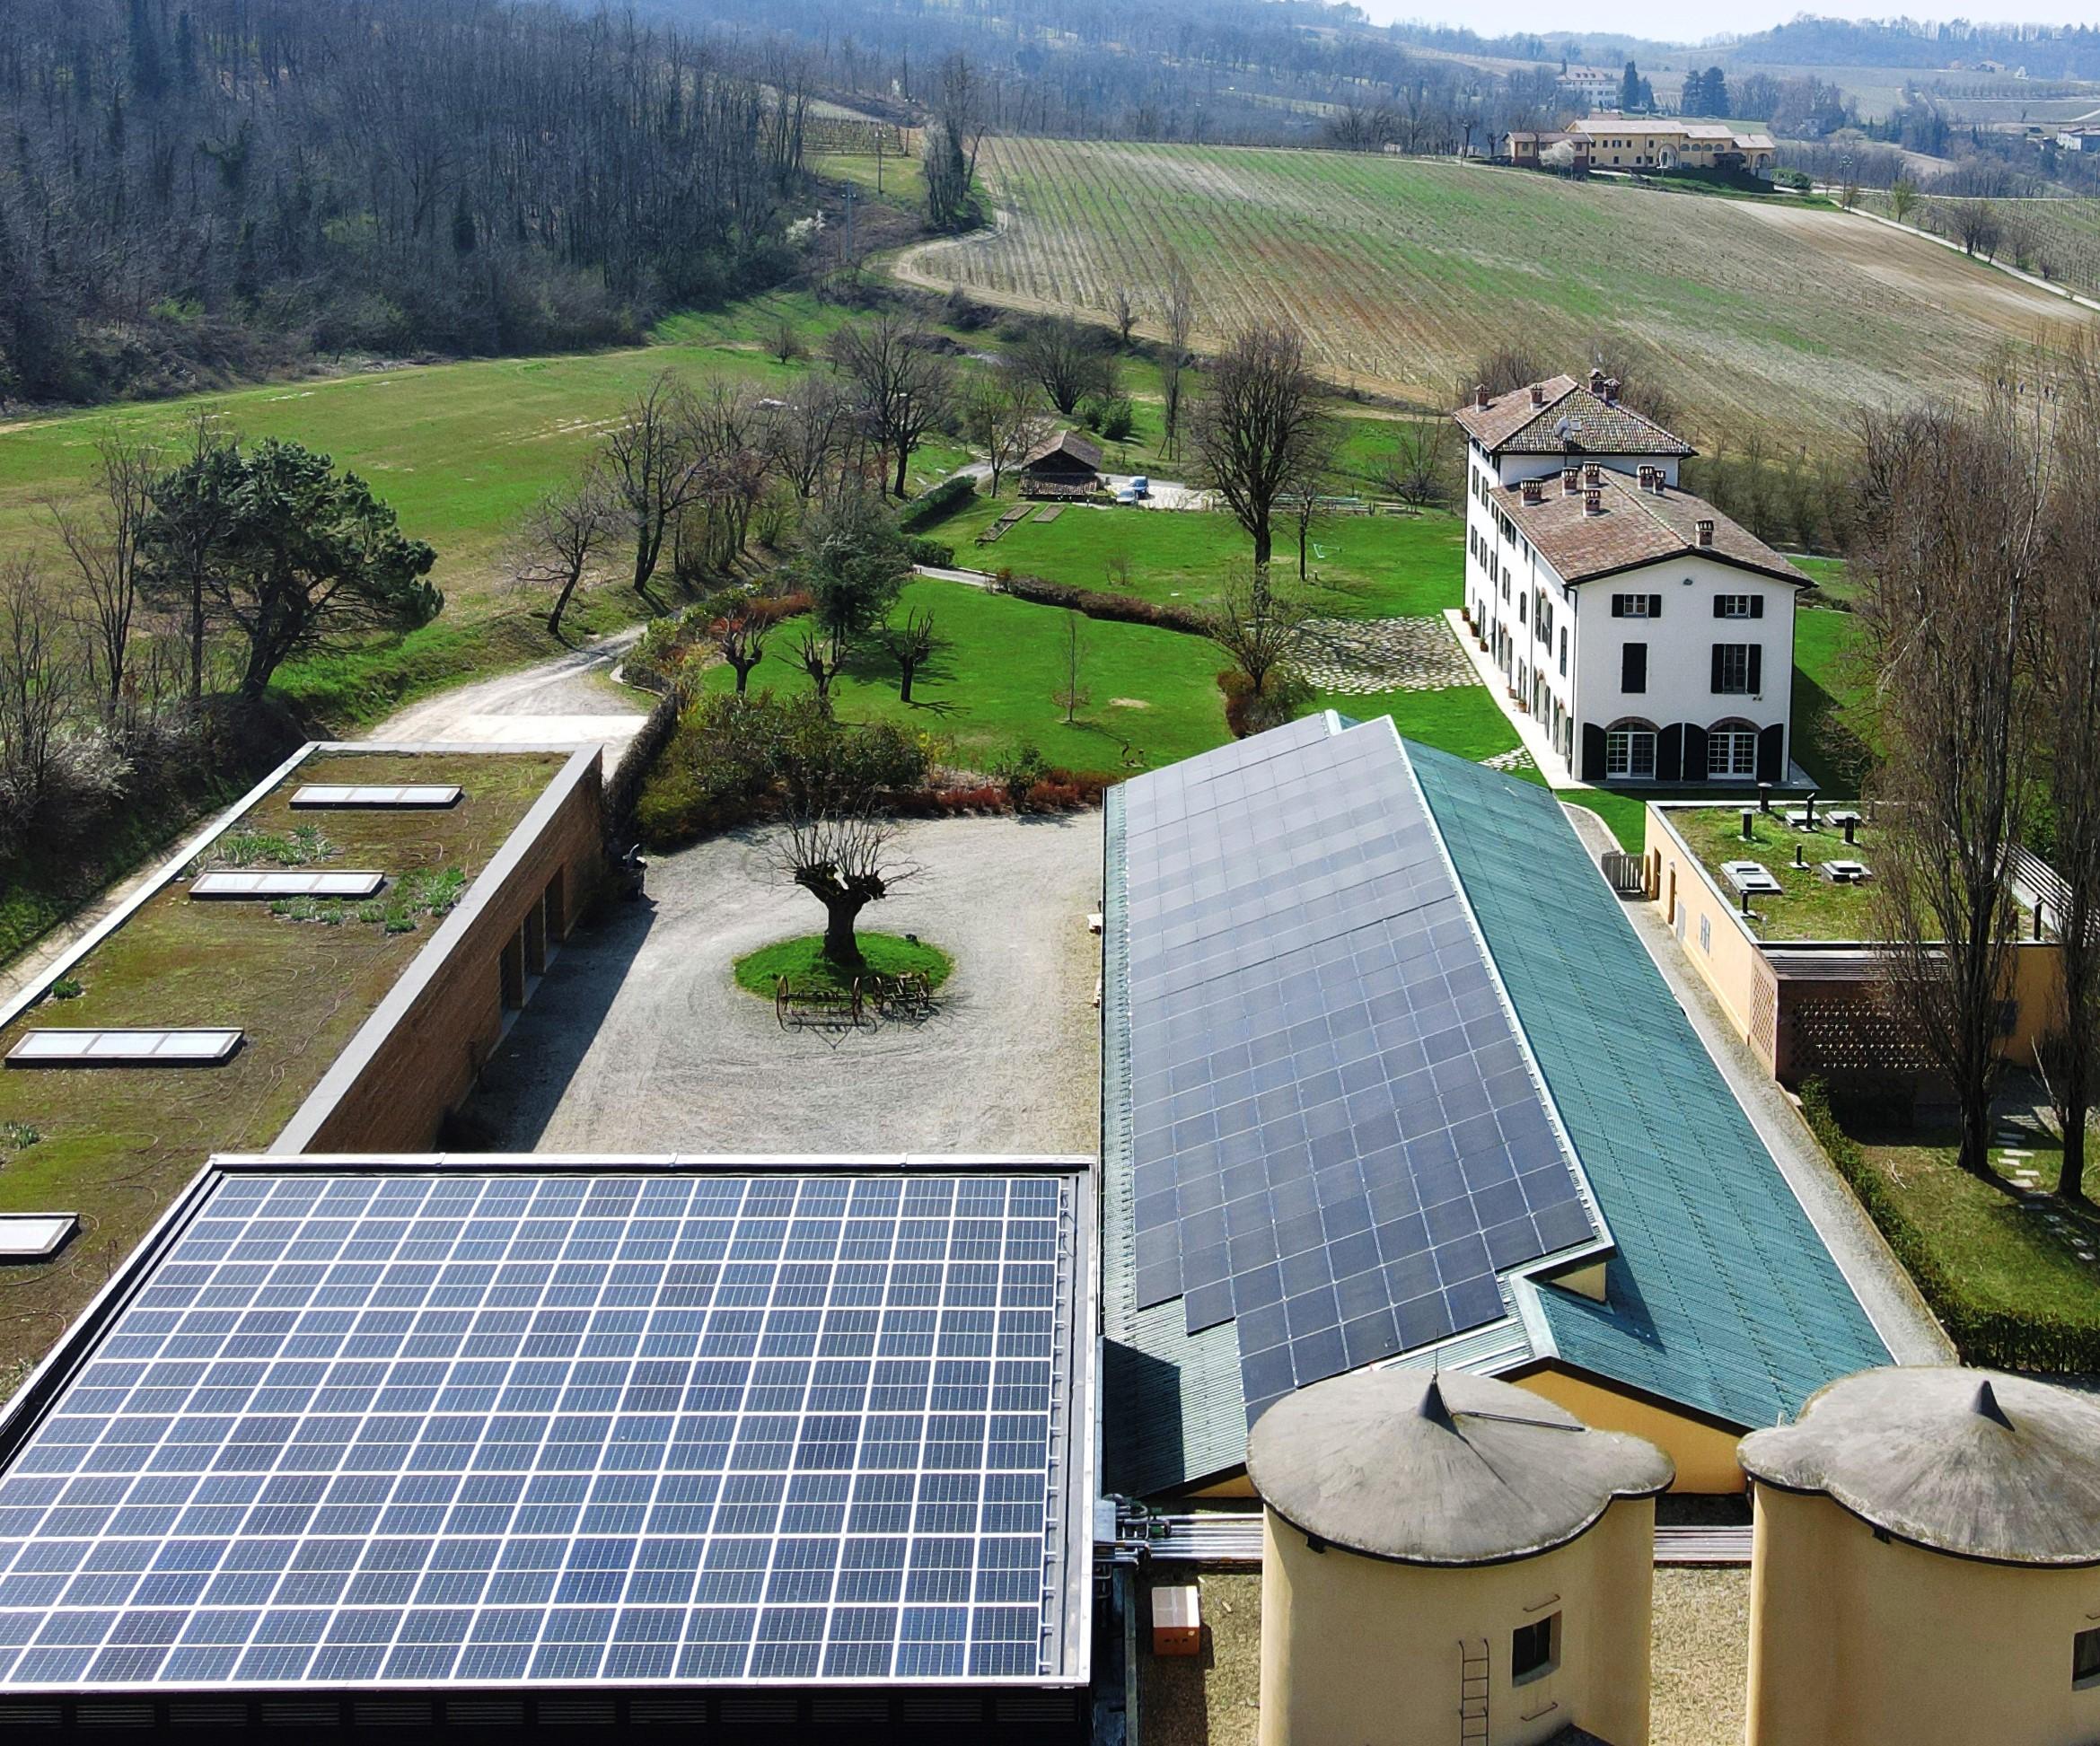 03laraia-aerea-fotovoltaico.jpg